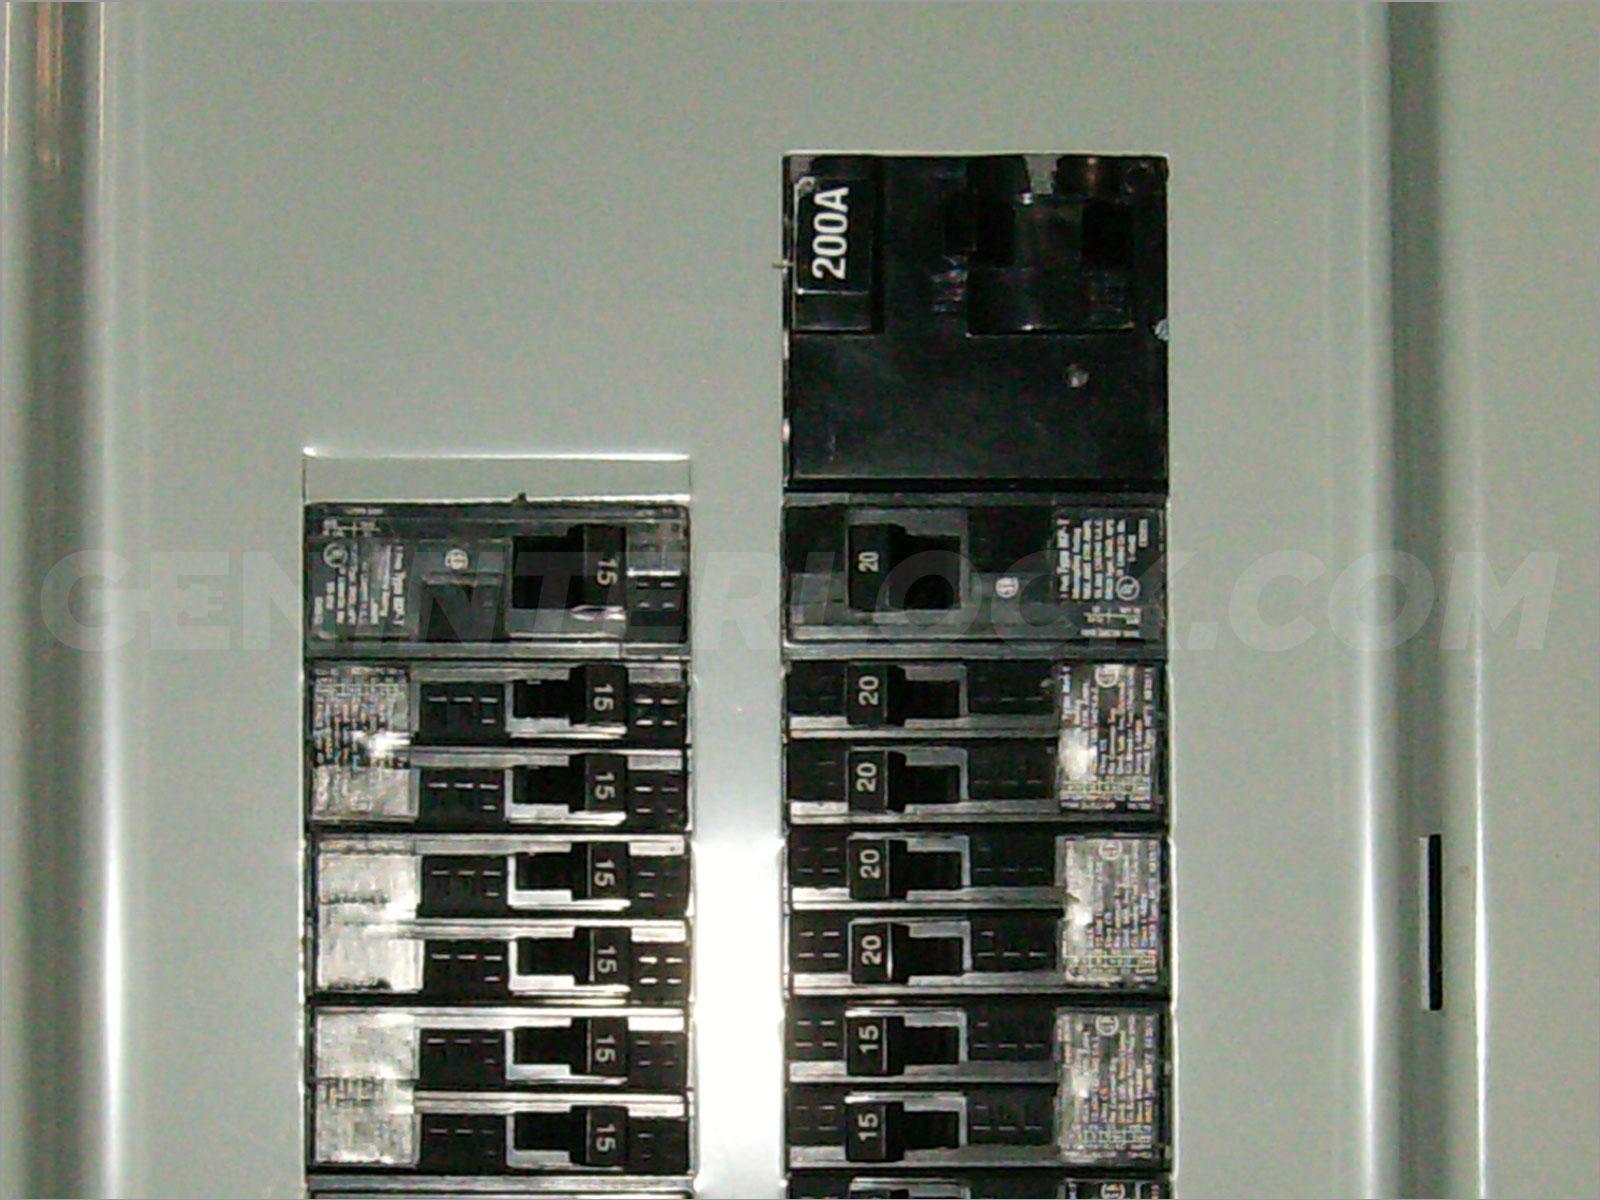 Oem Model Generator Interlock Kit Siemens And Murray 150